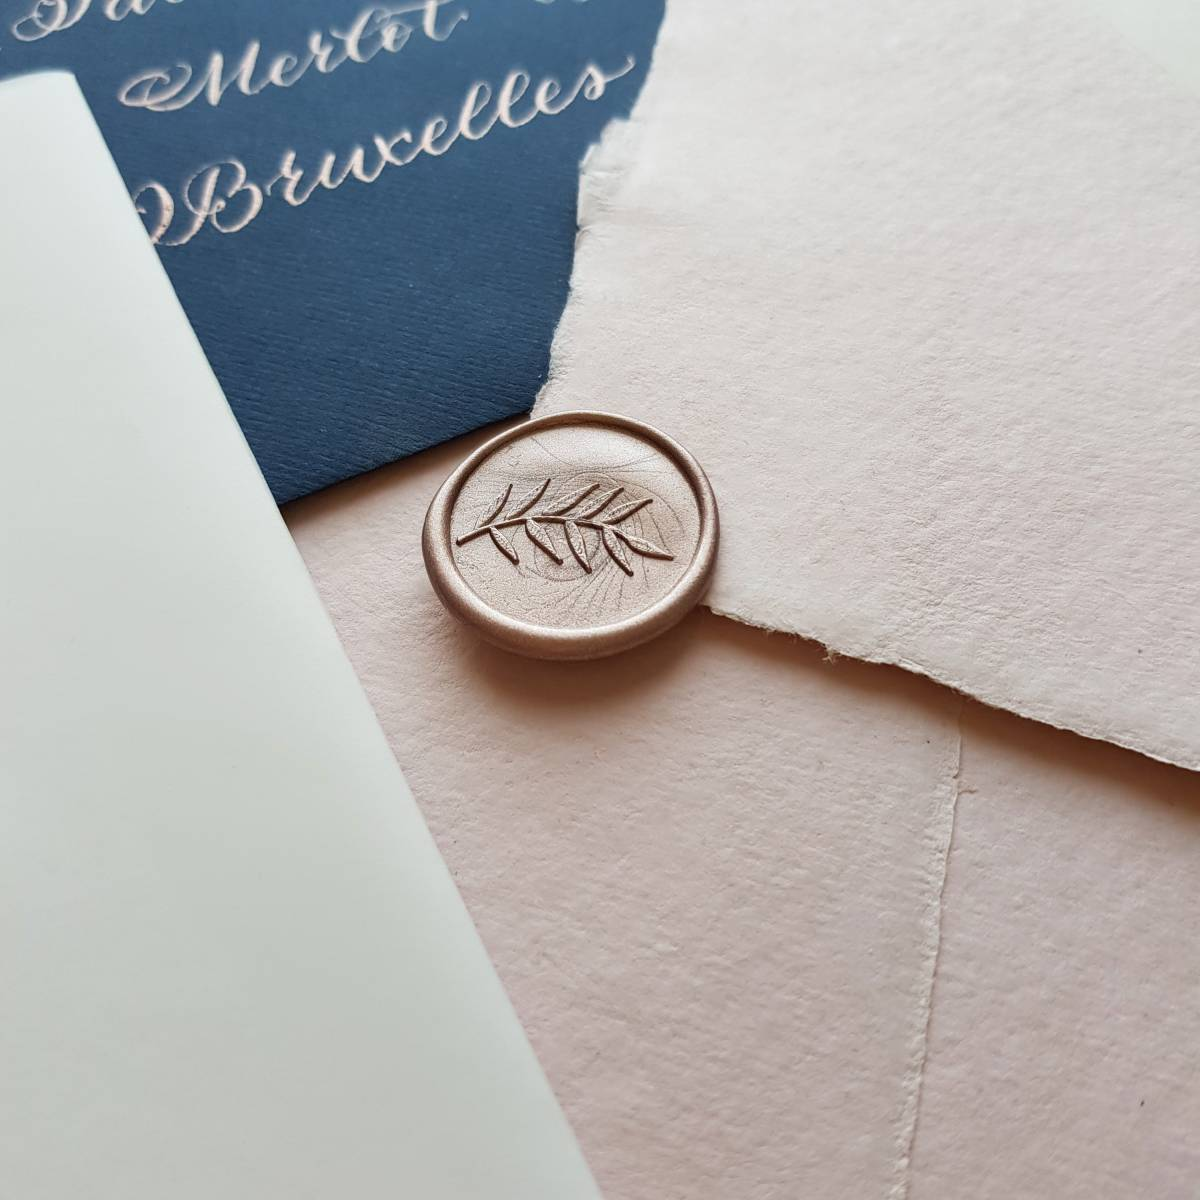 Touch of Gold - Trouwuitnodiging - Huwelijksuitnodiging - Kalligrafie - House of Weddings - 14